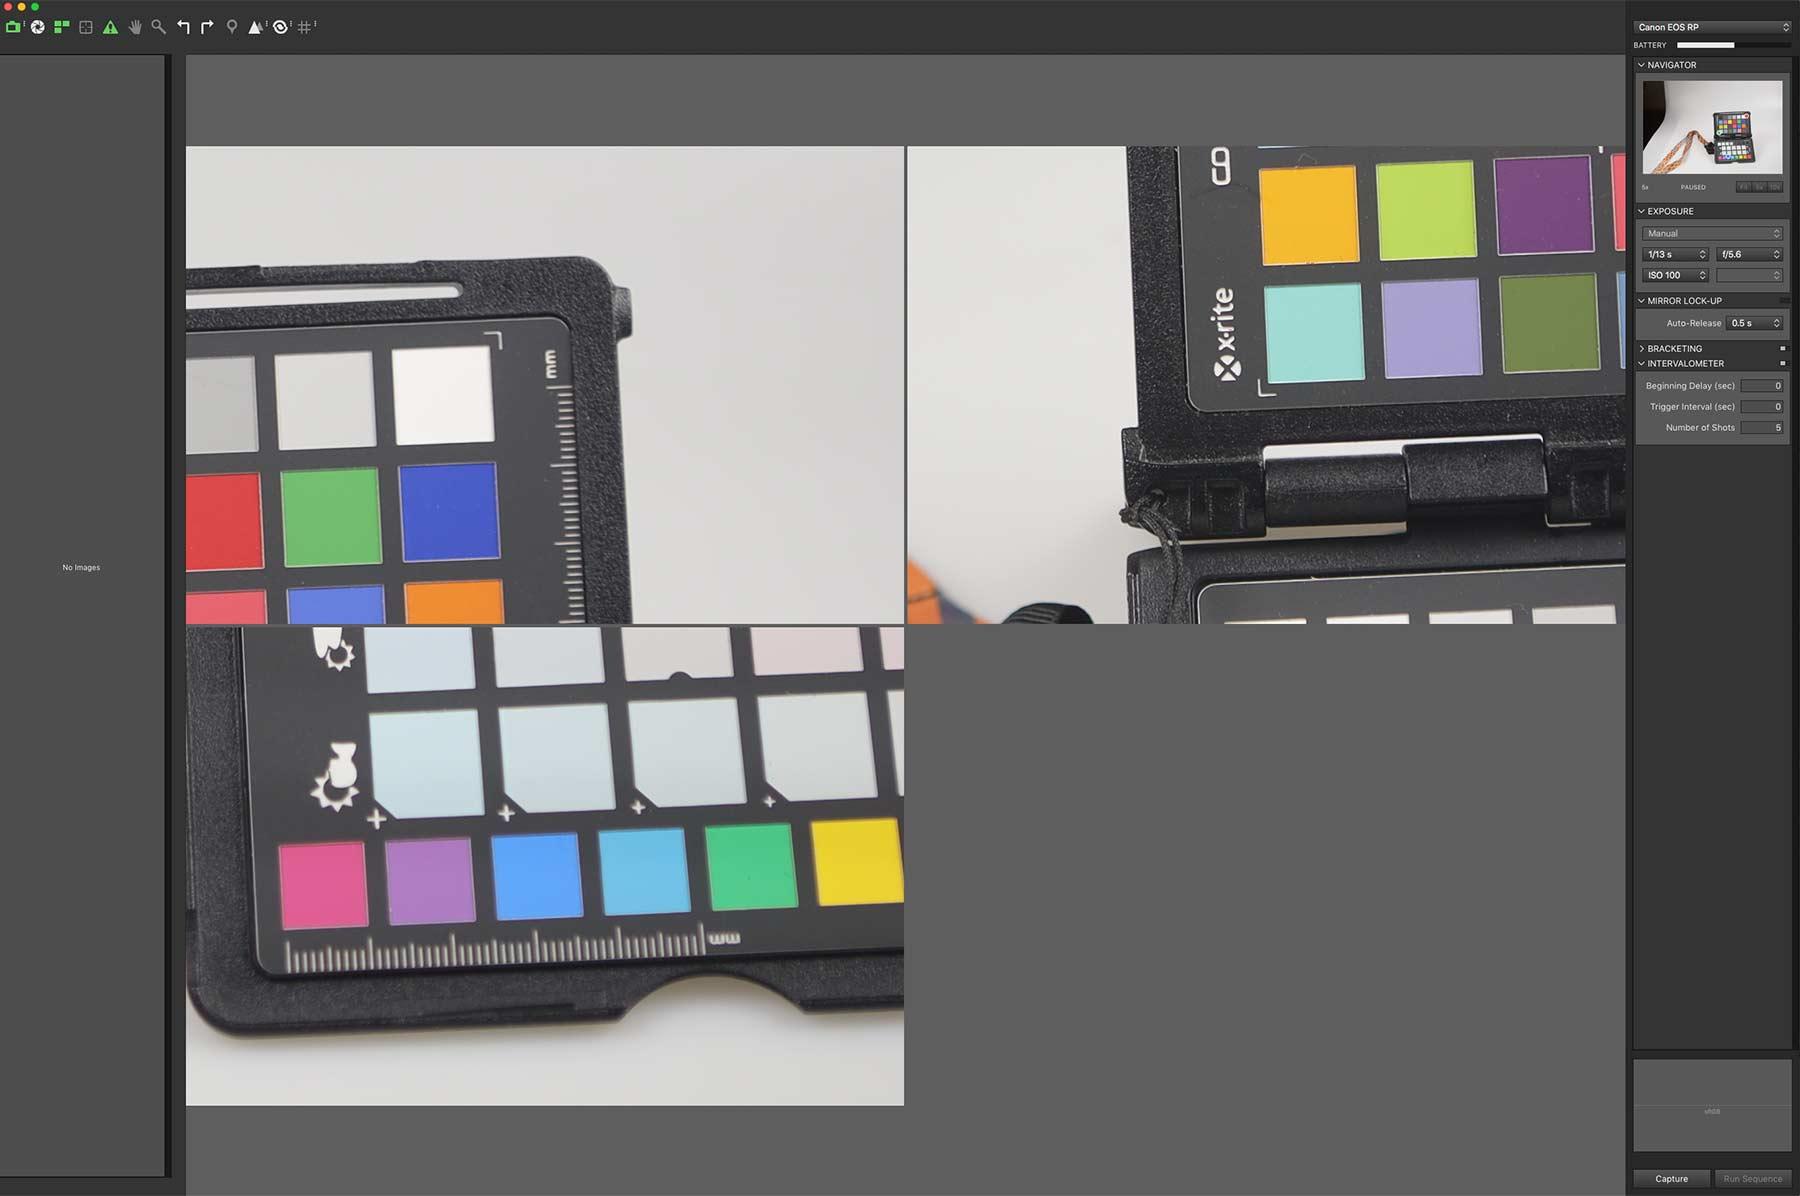 split-screen-mode